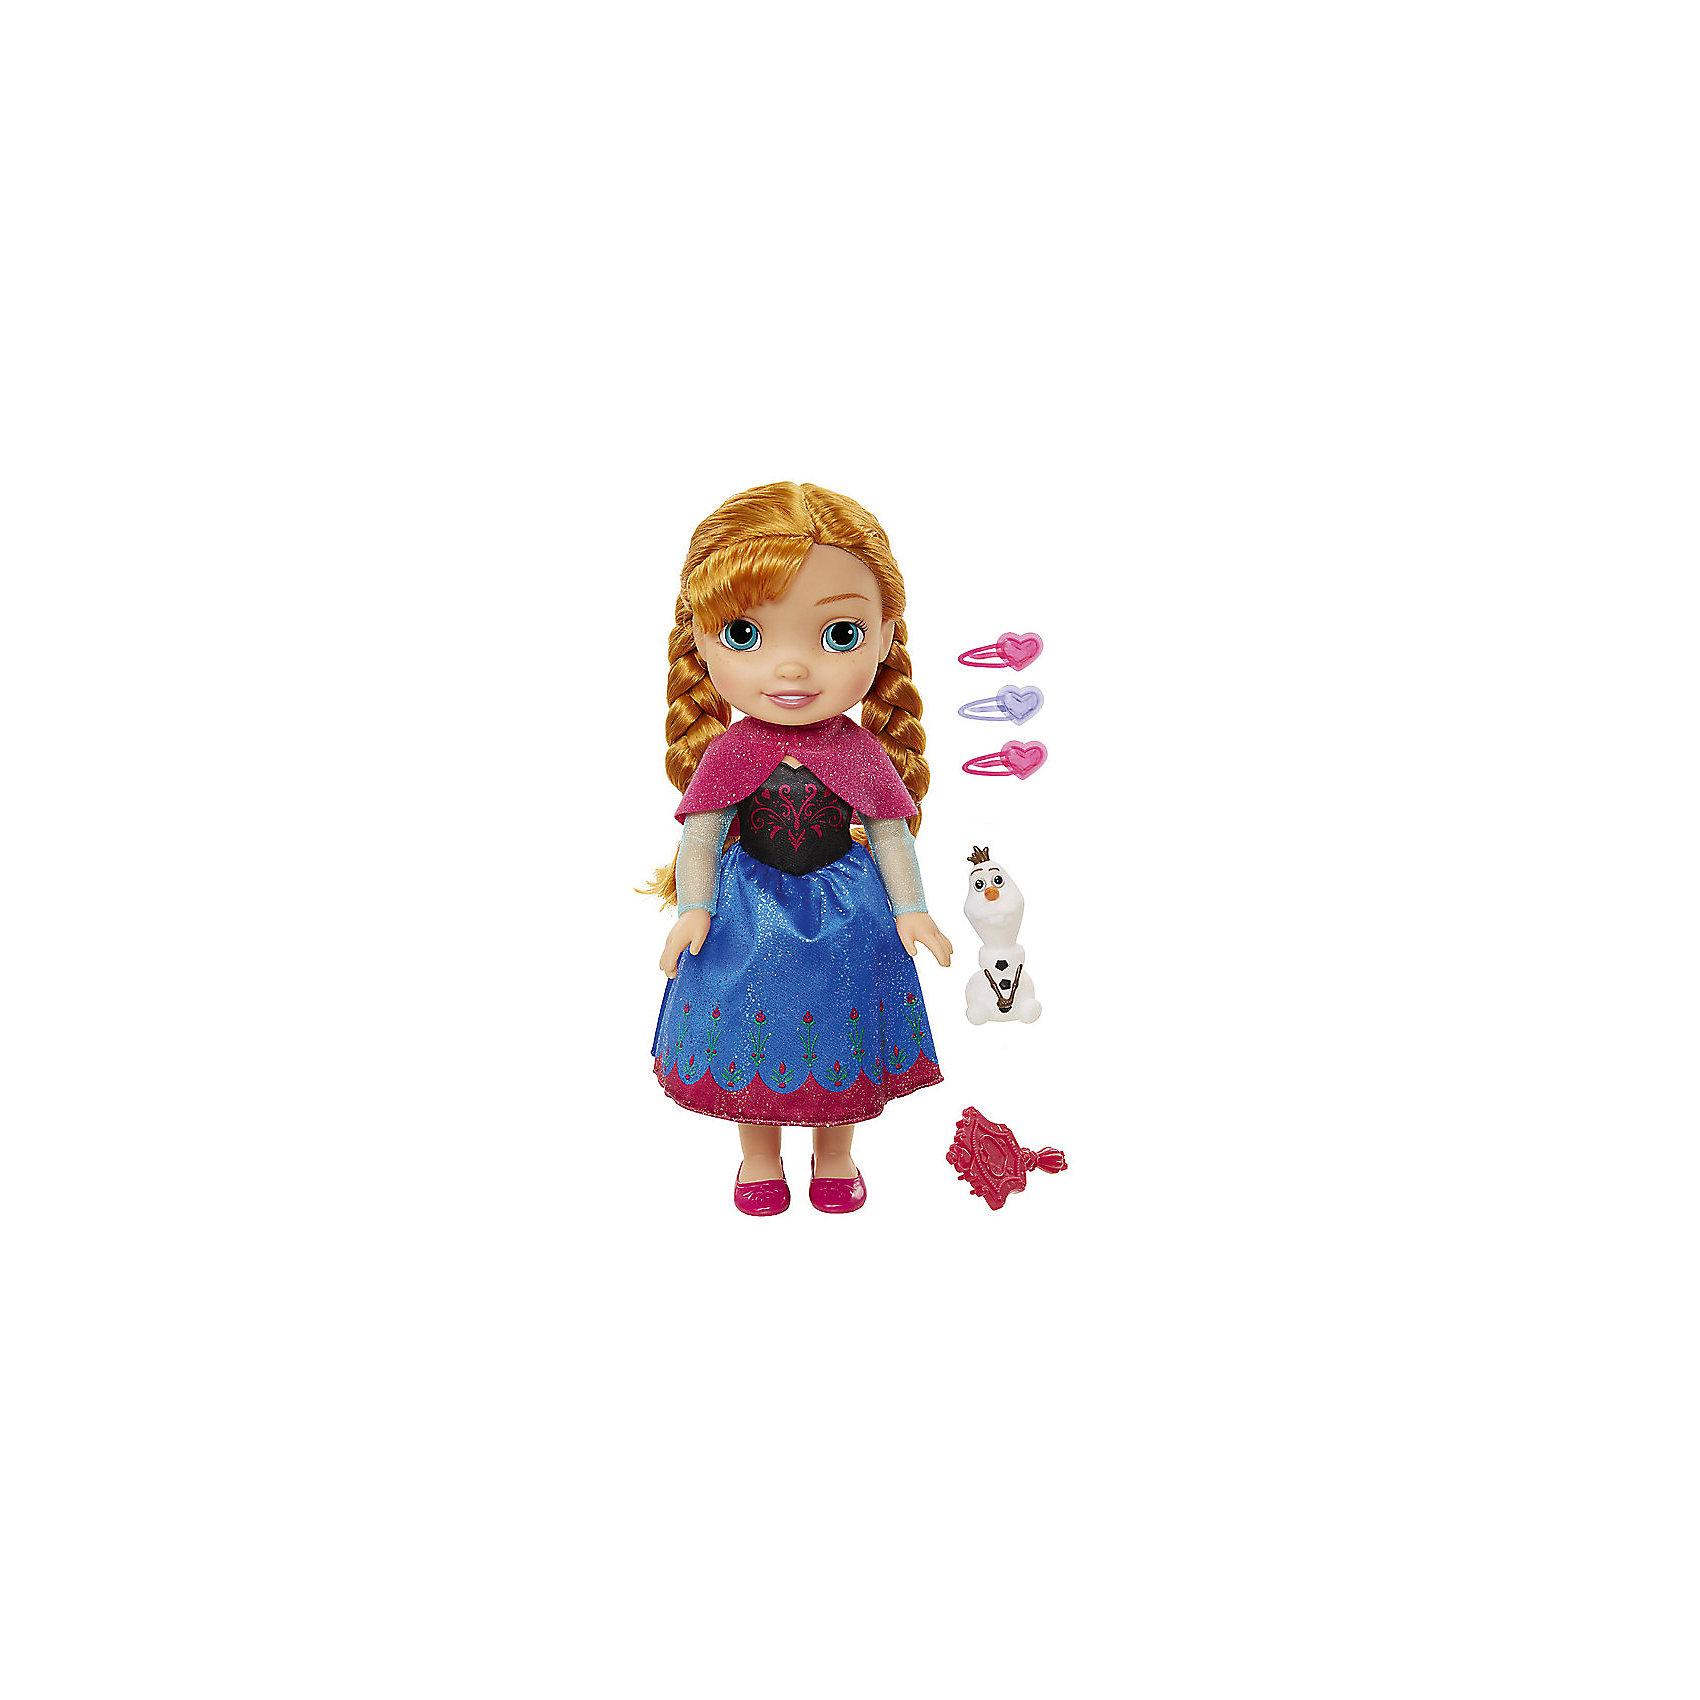 Jakks Pacific Кукла-малышка Холодное сердце с аксессуарами, Анна, 35 см кукла jakks pacific аврора